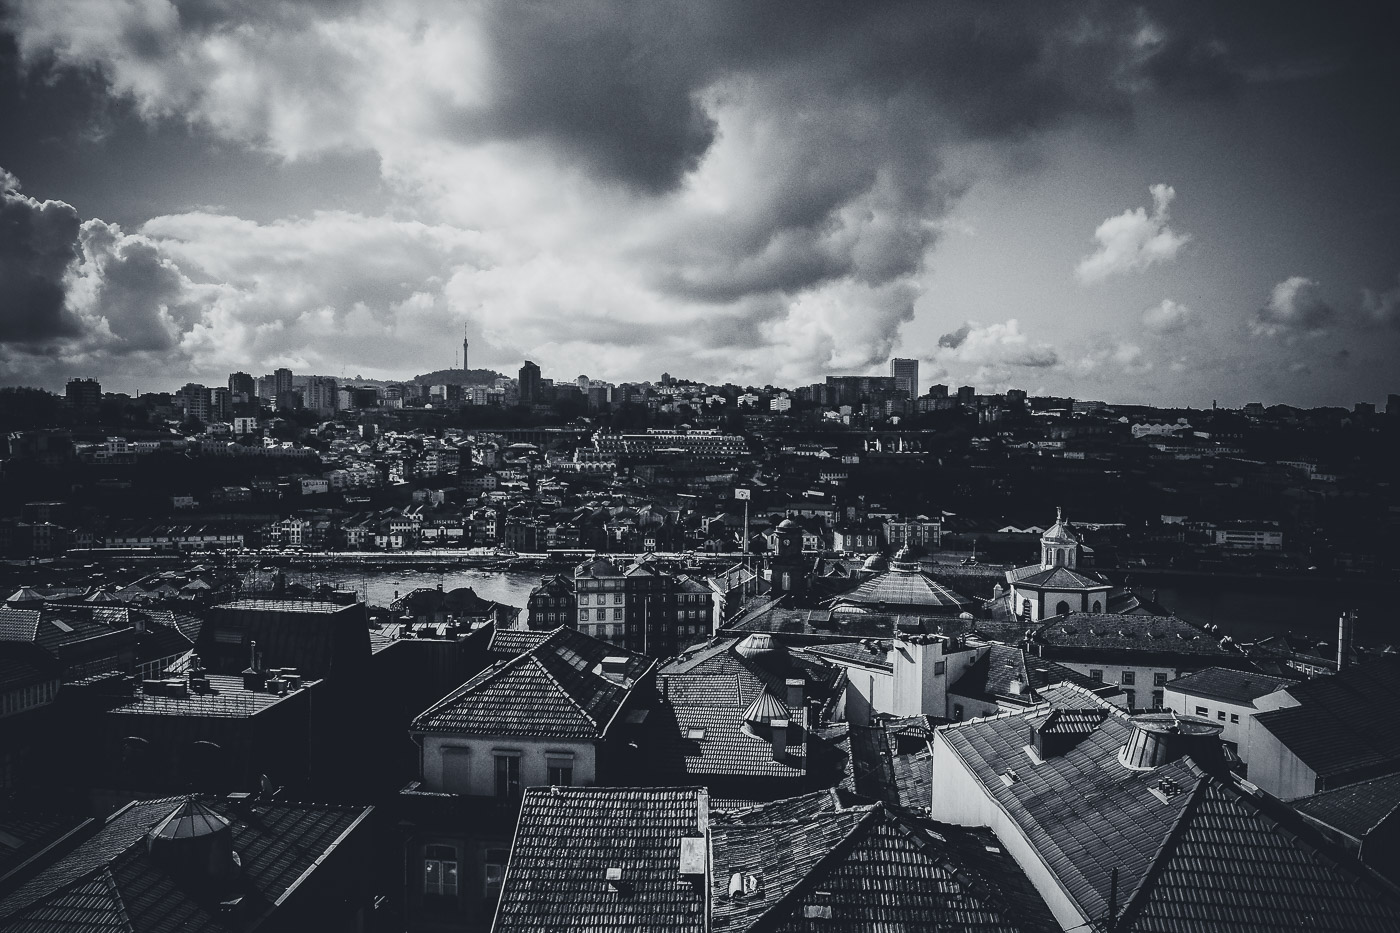 hb images - Porto - moring walk - 1